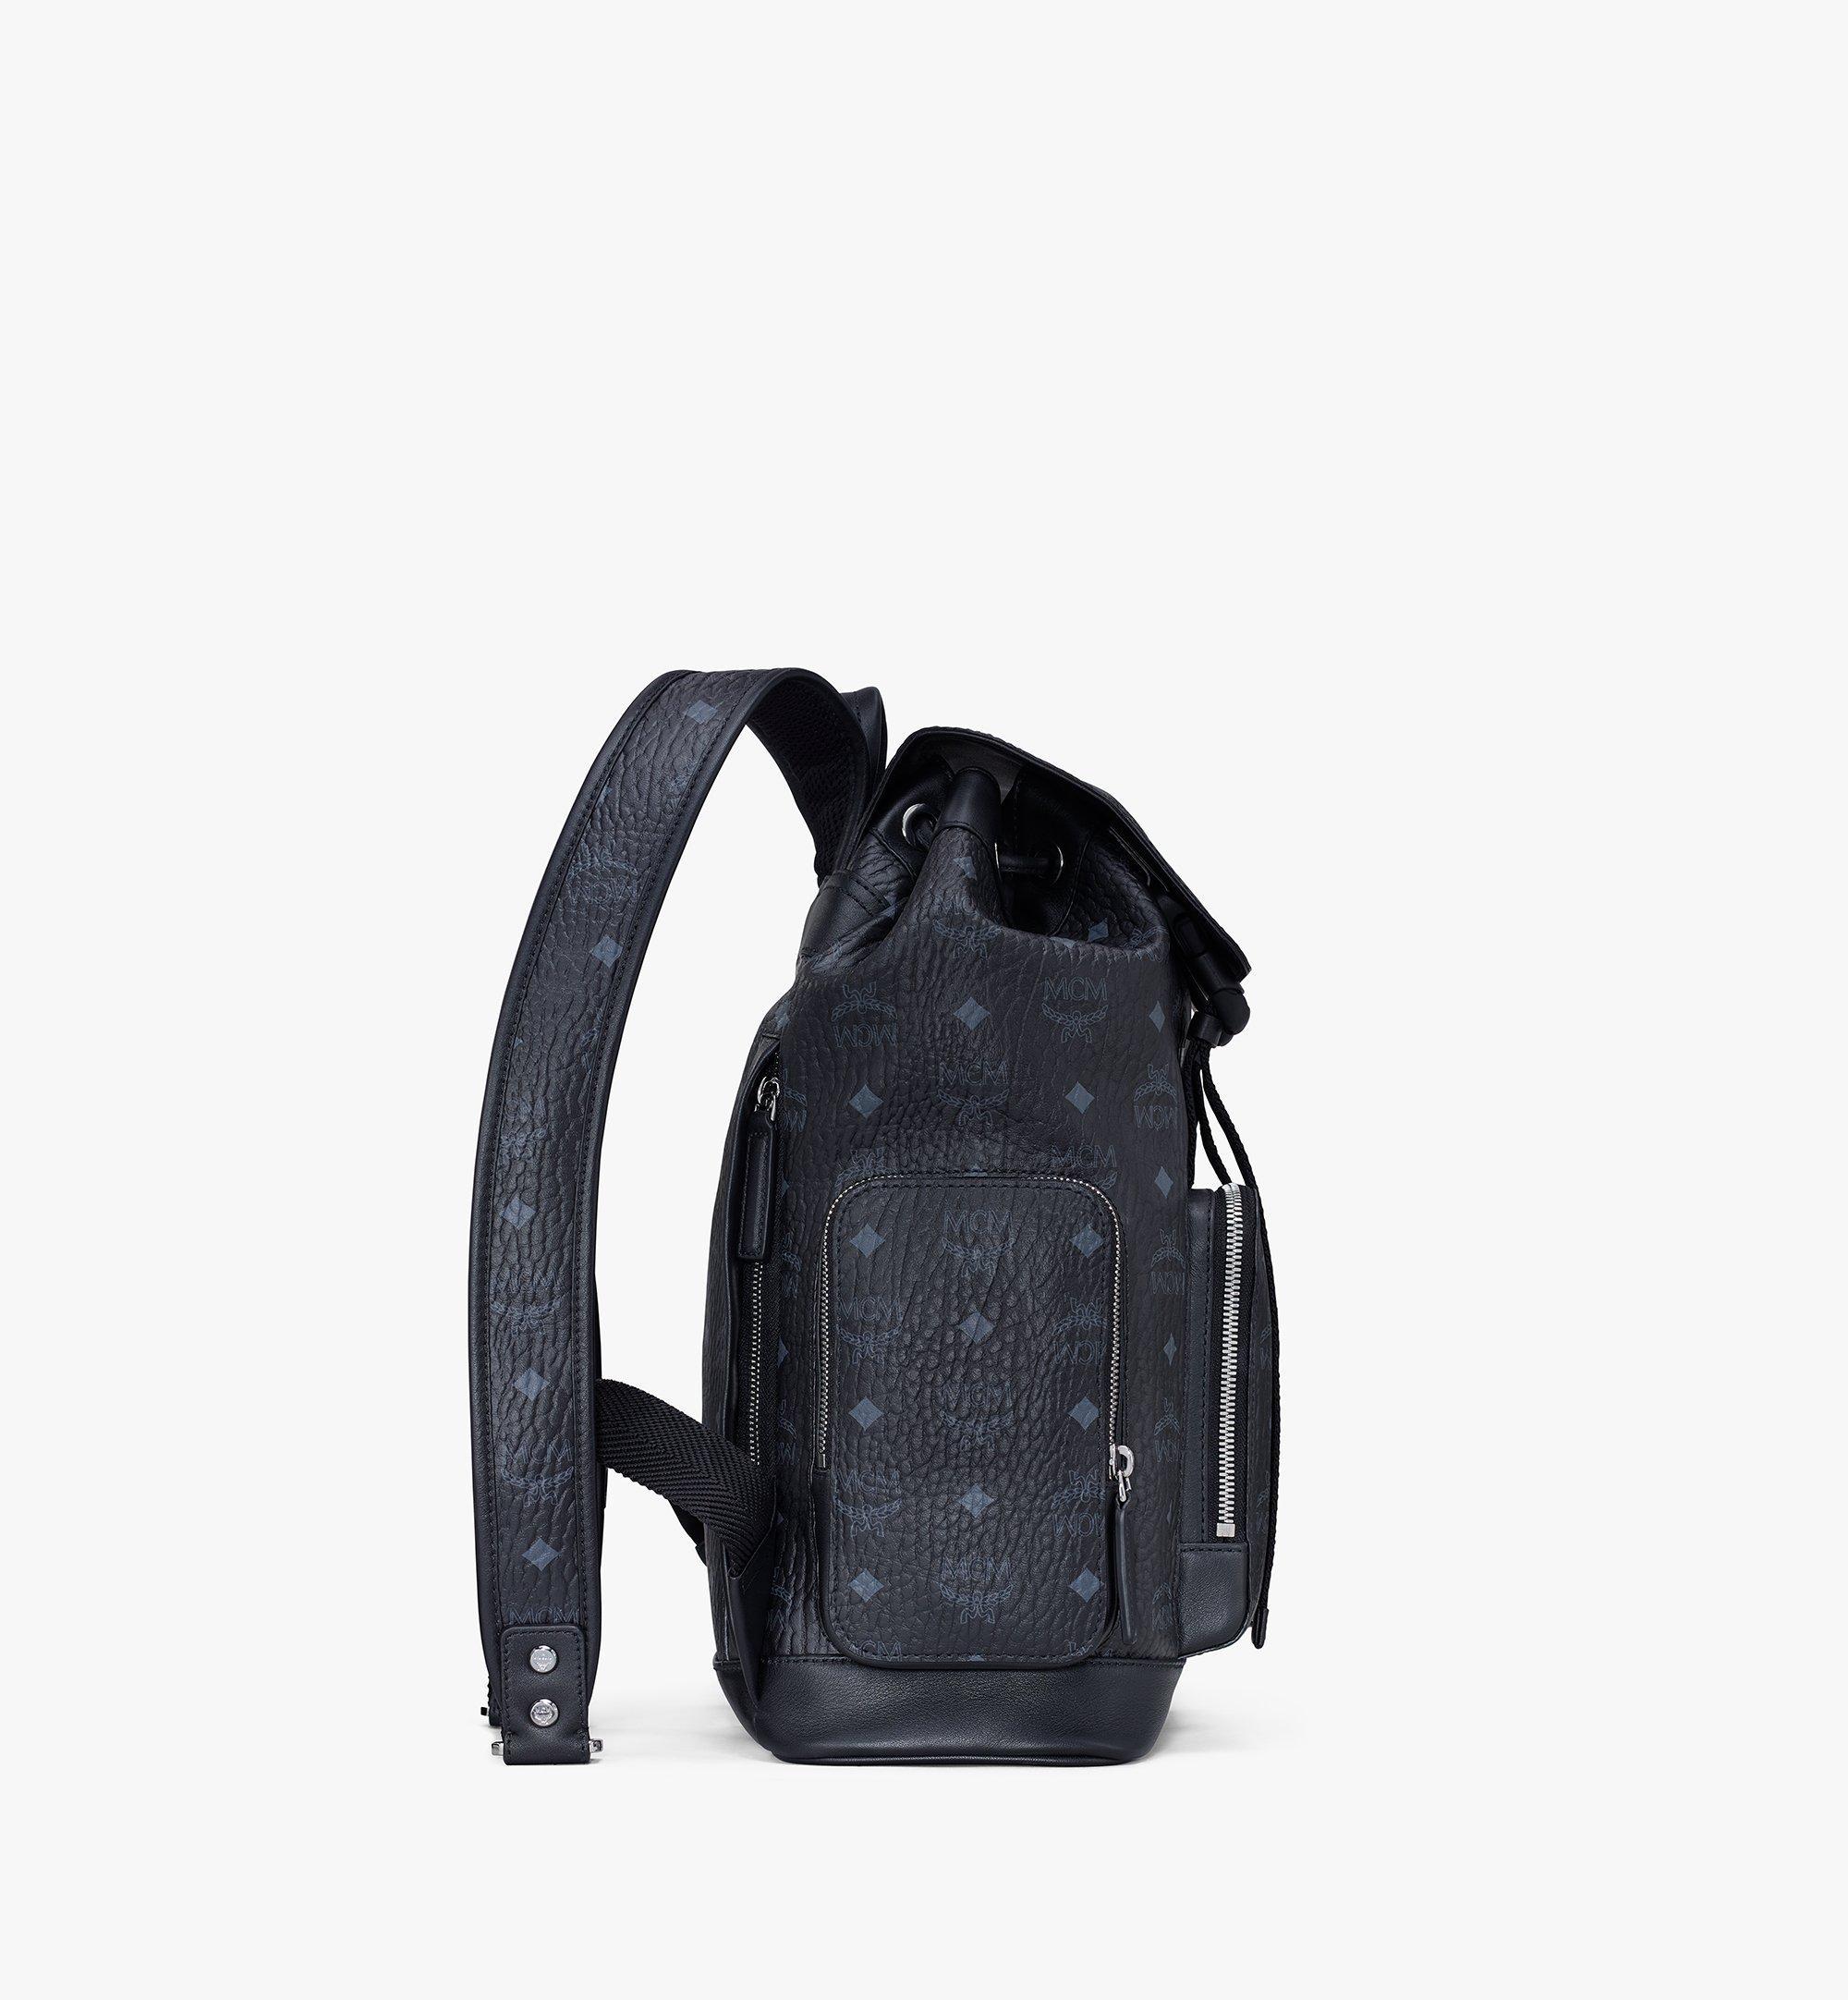 MCM Brandenburg Backpack in Visetos Black MMKASBG05BK001 Alternate View 1